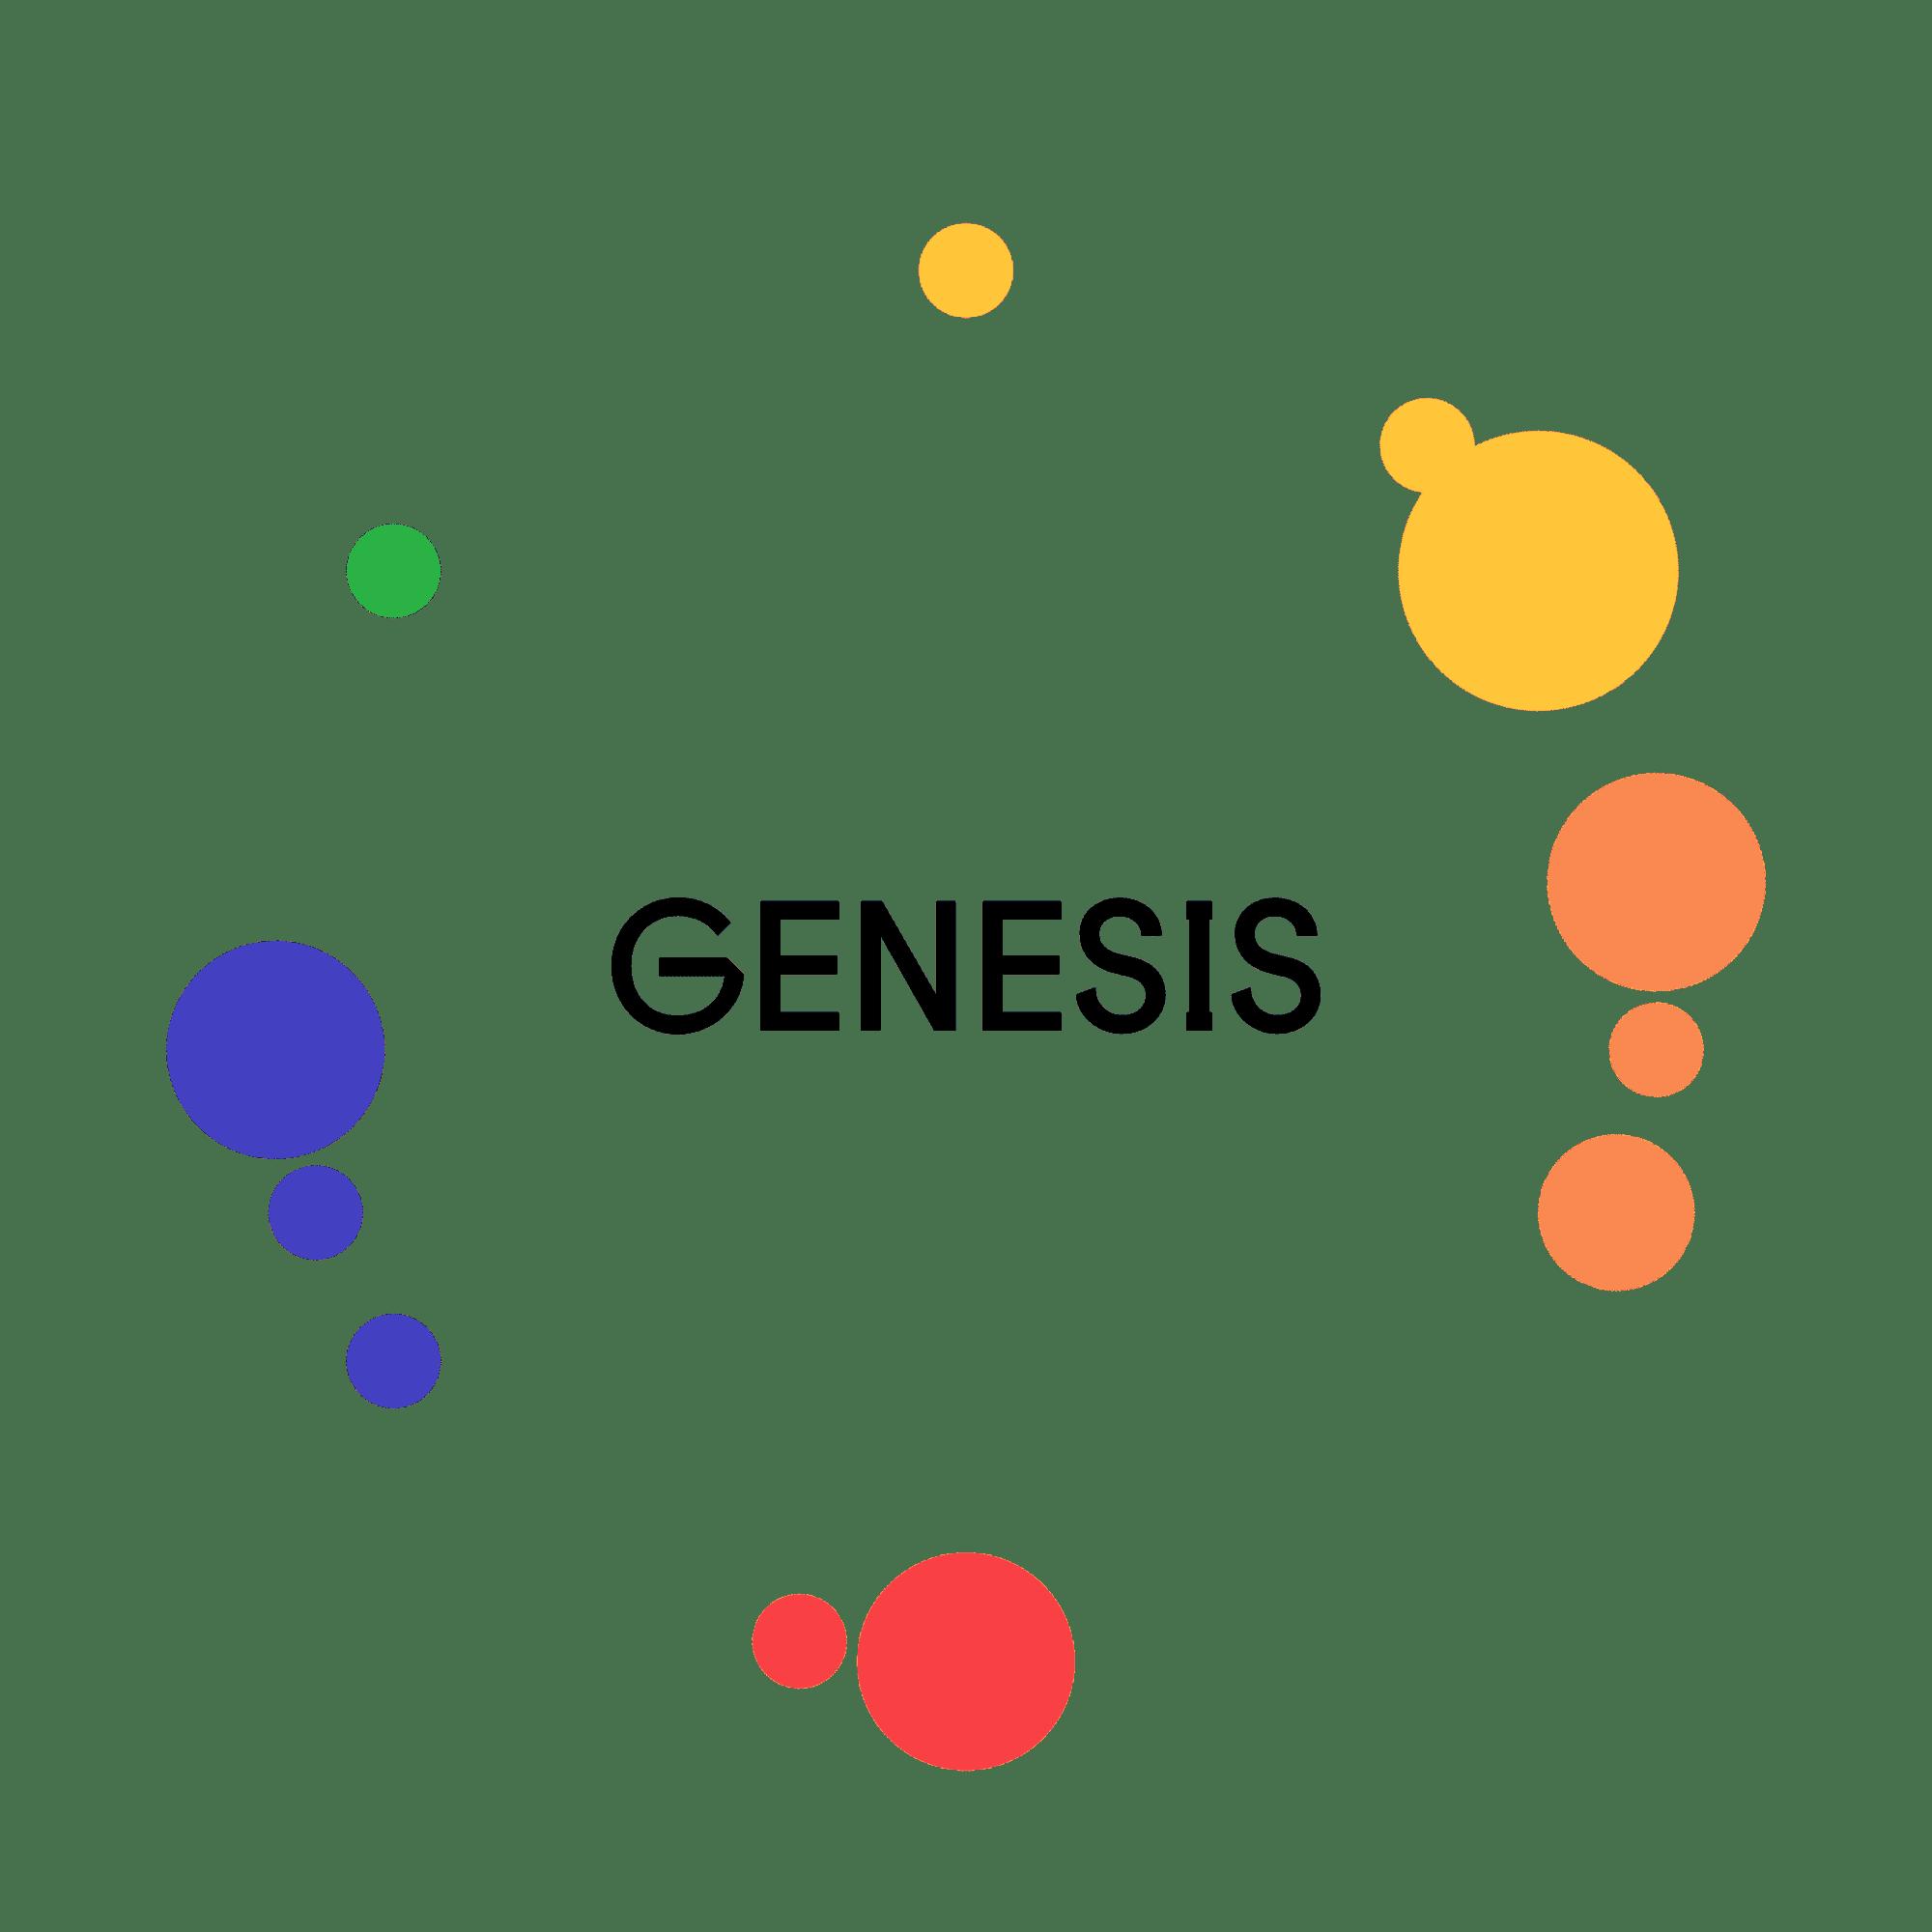 genesis-min